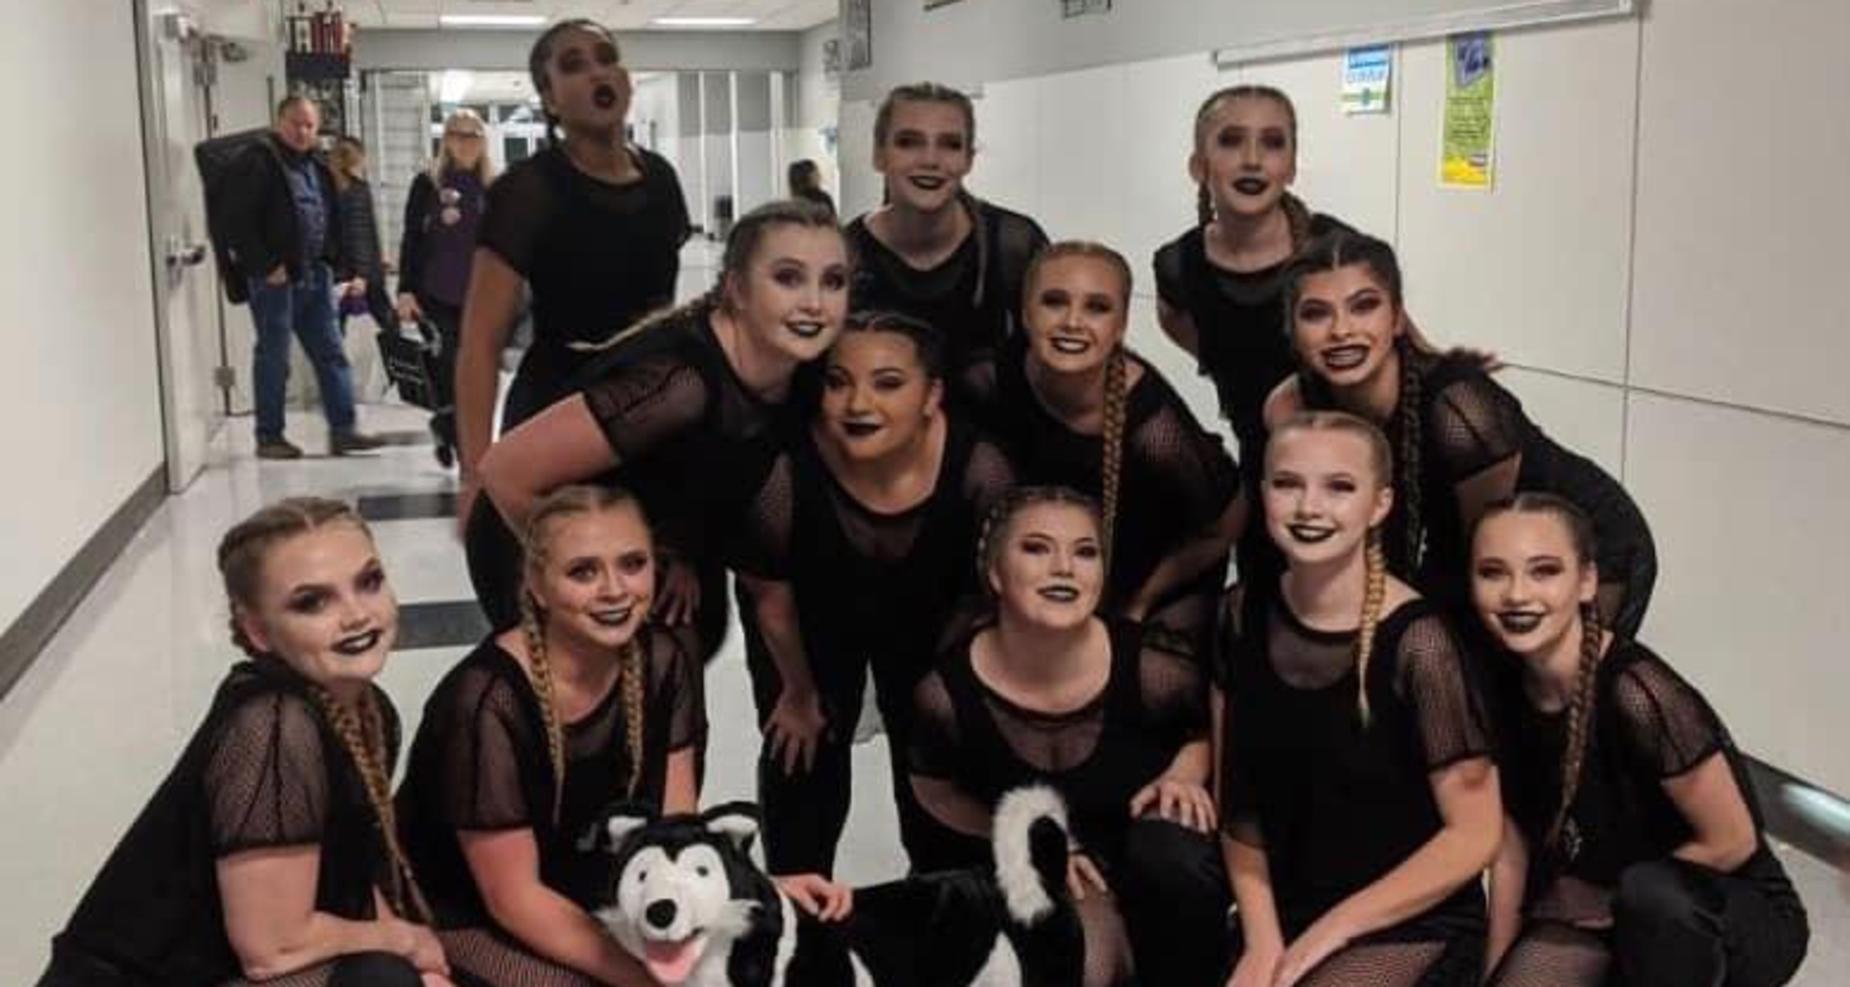 Dance Team with Husky